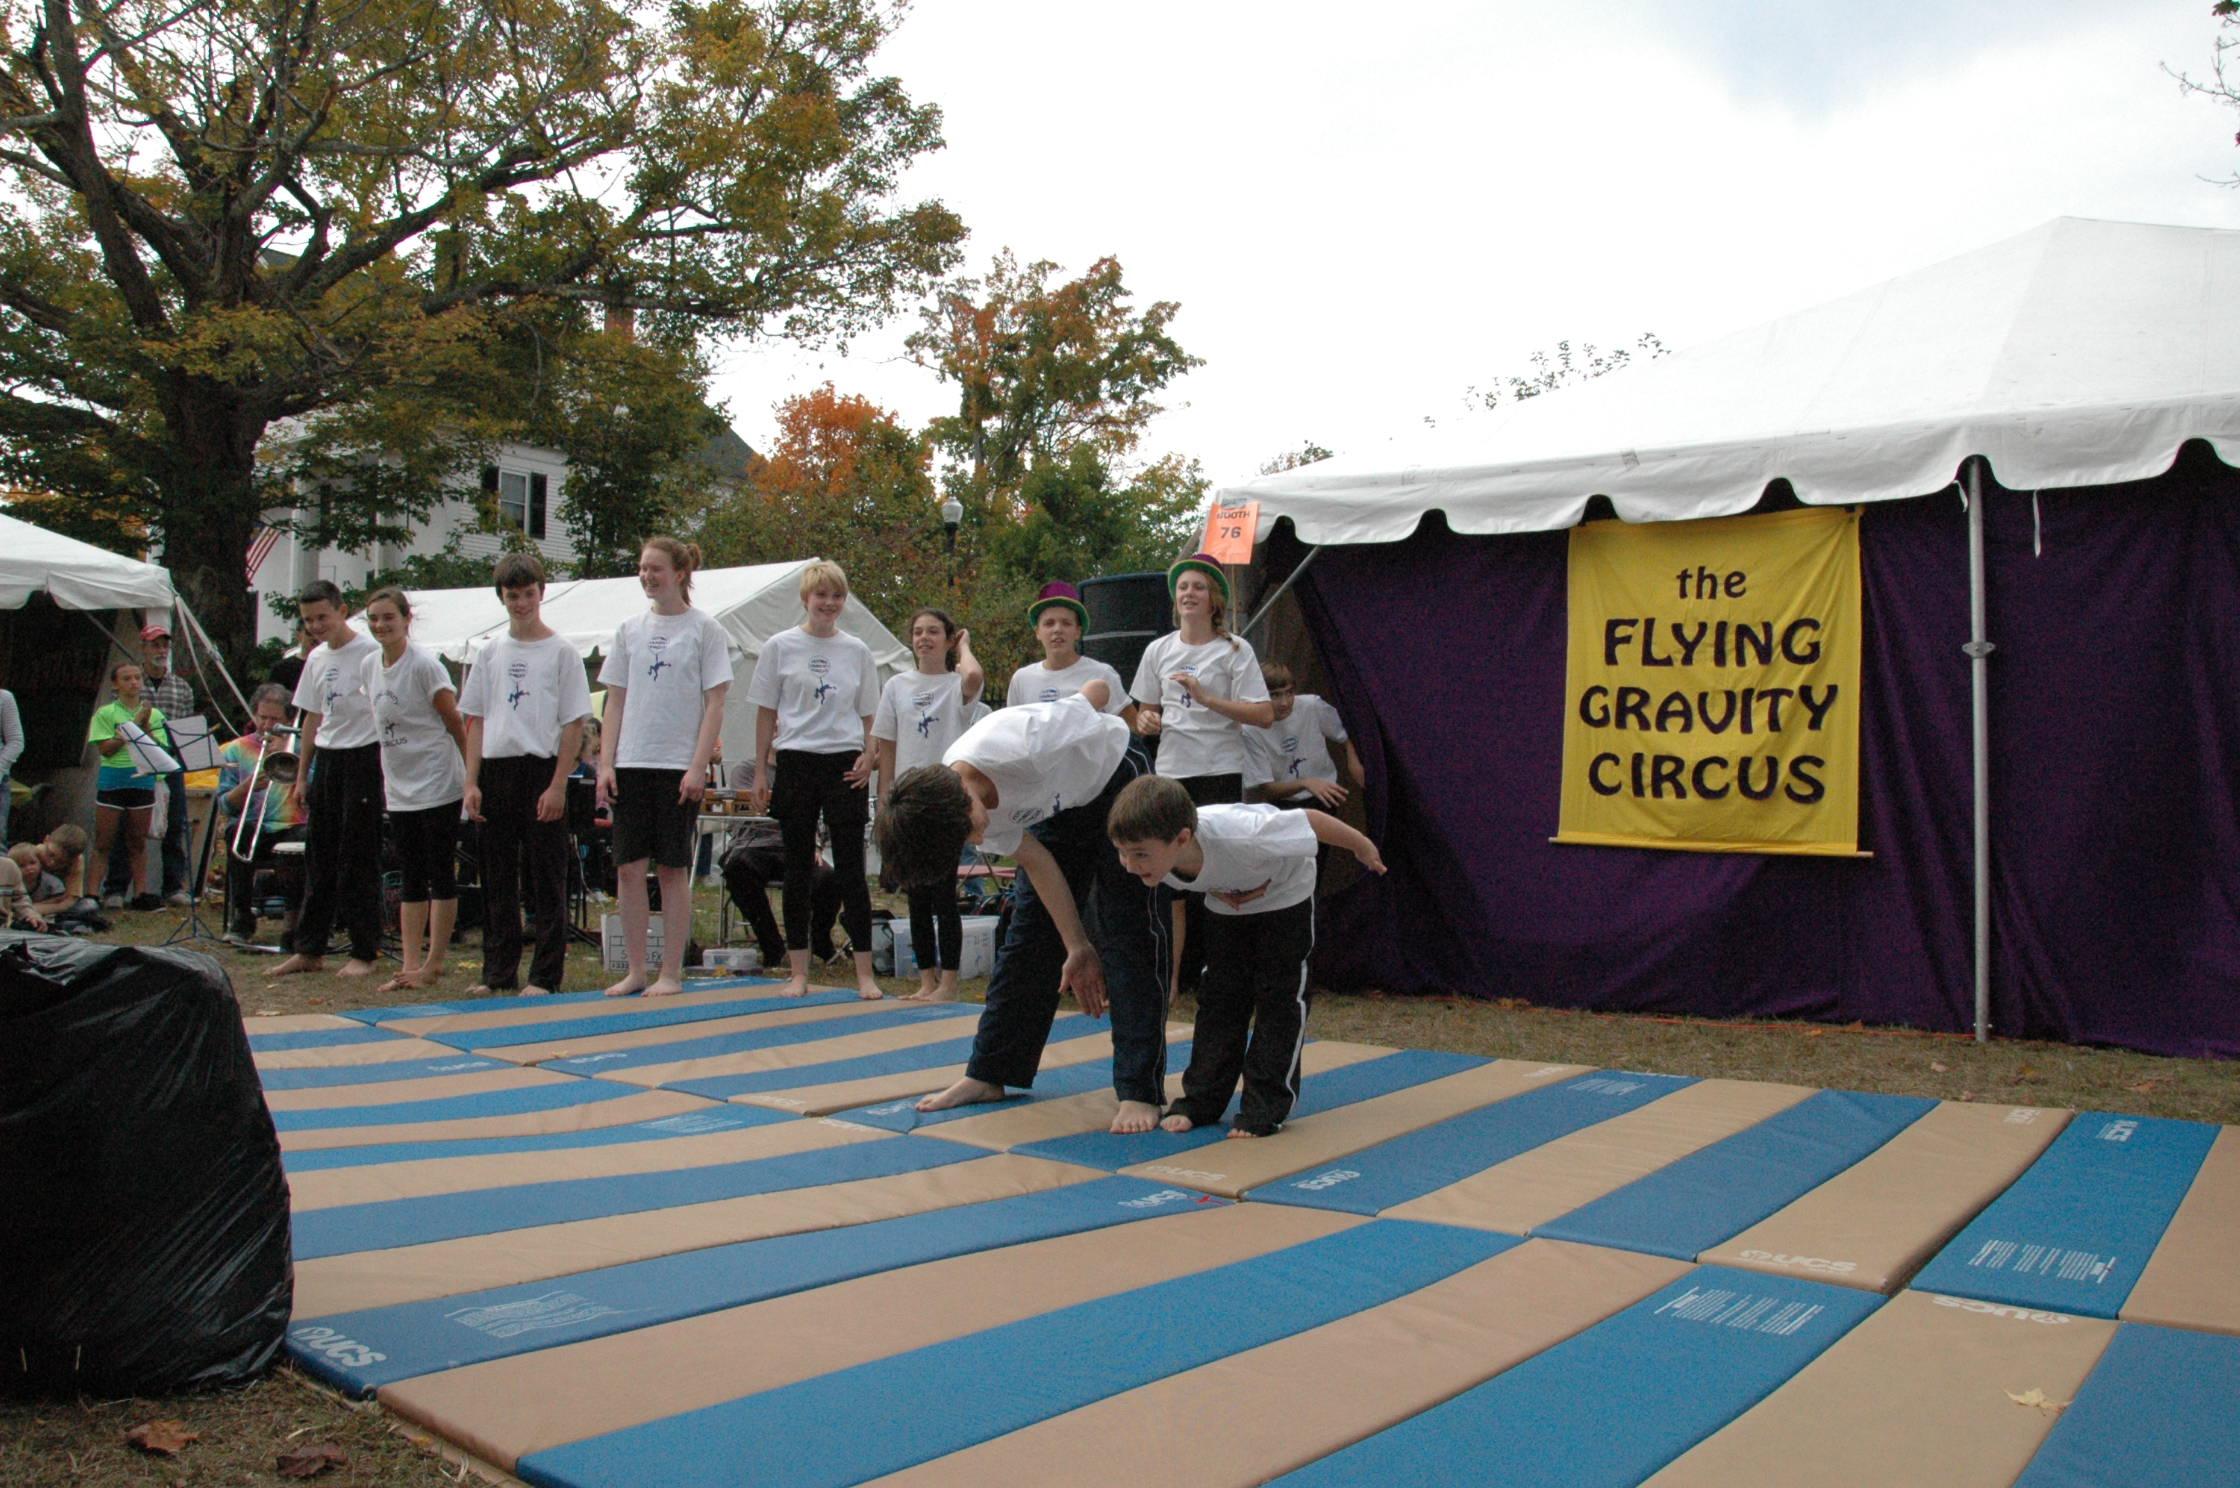 2012-10-06 Flyin Gravity Circus - Pumpkin 150.JPG